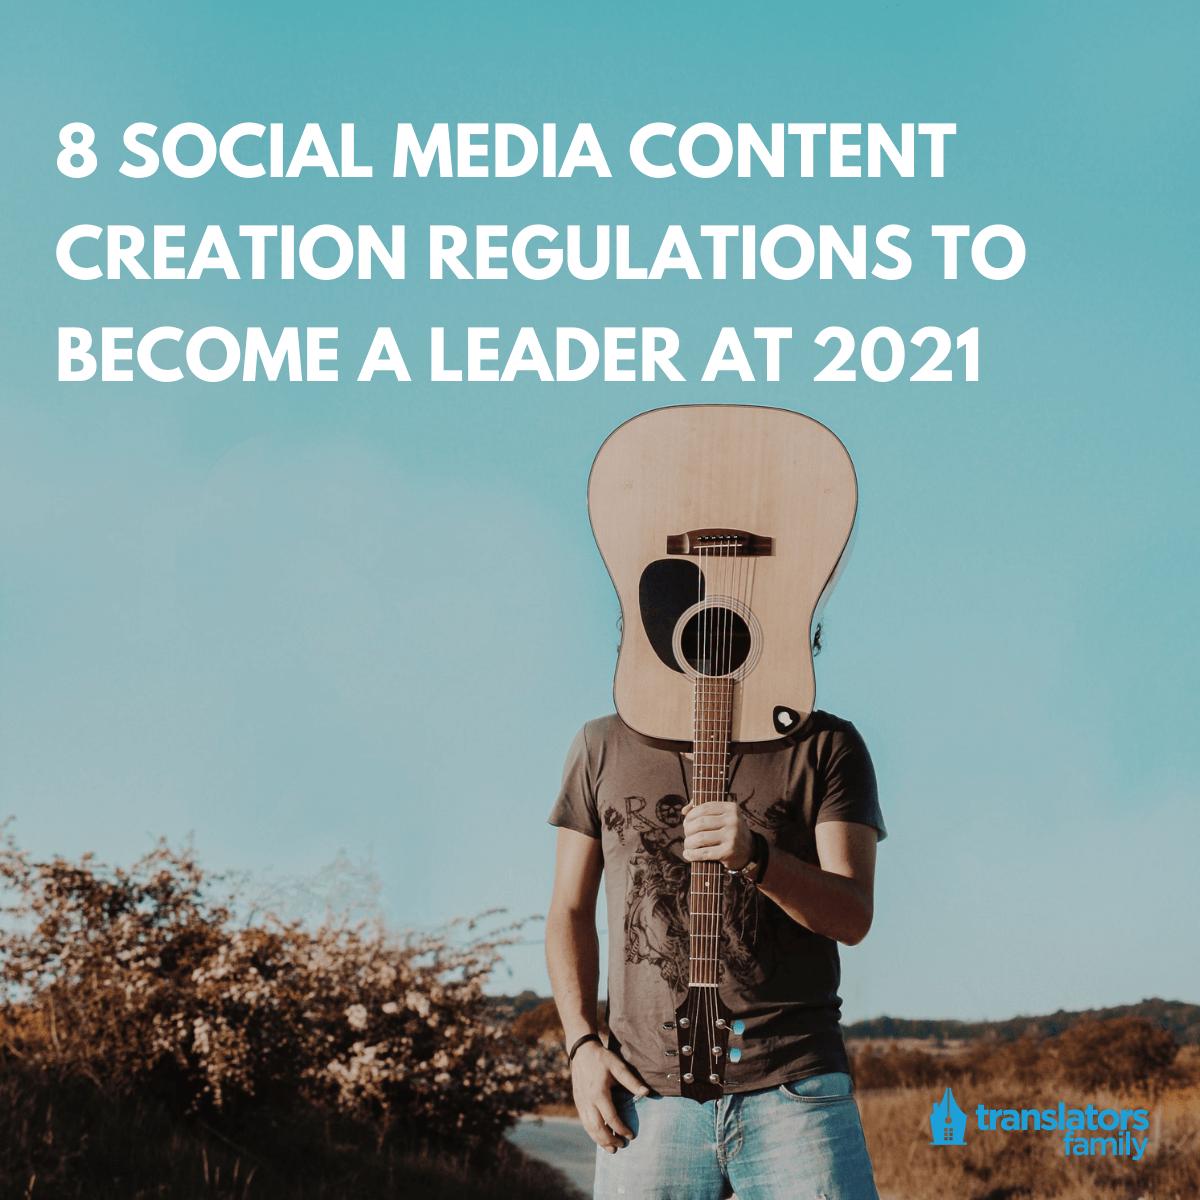 social media content in 2021